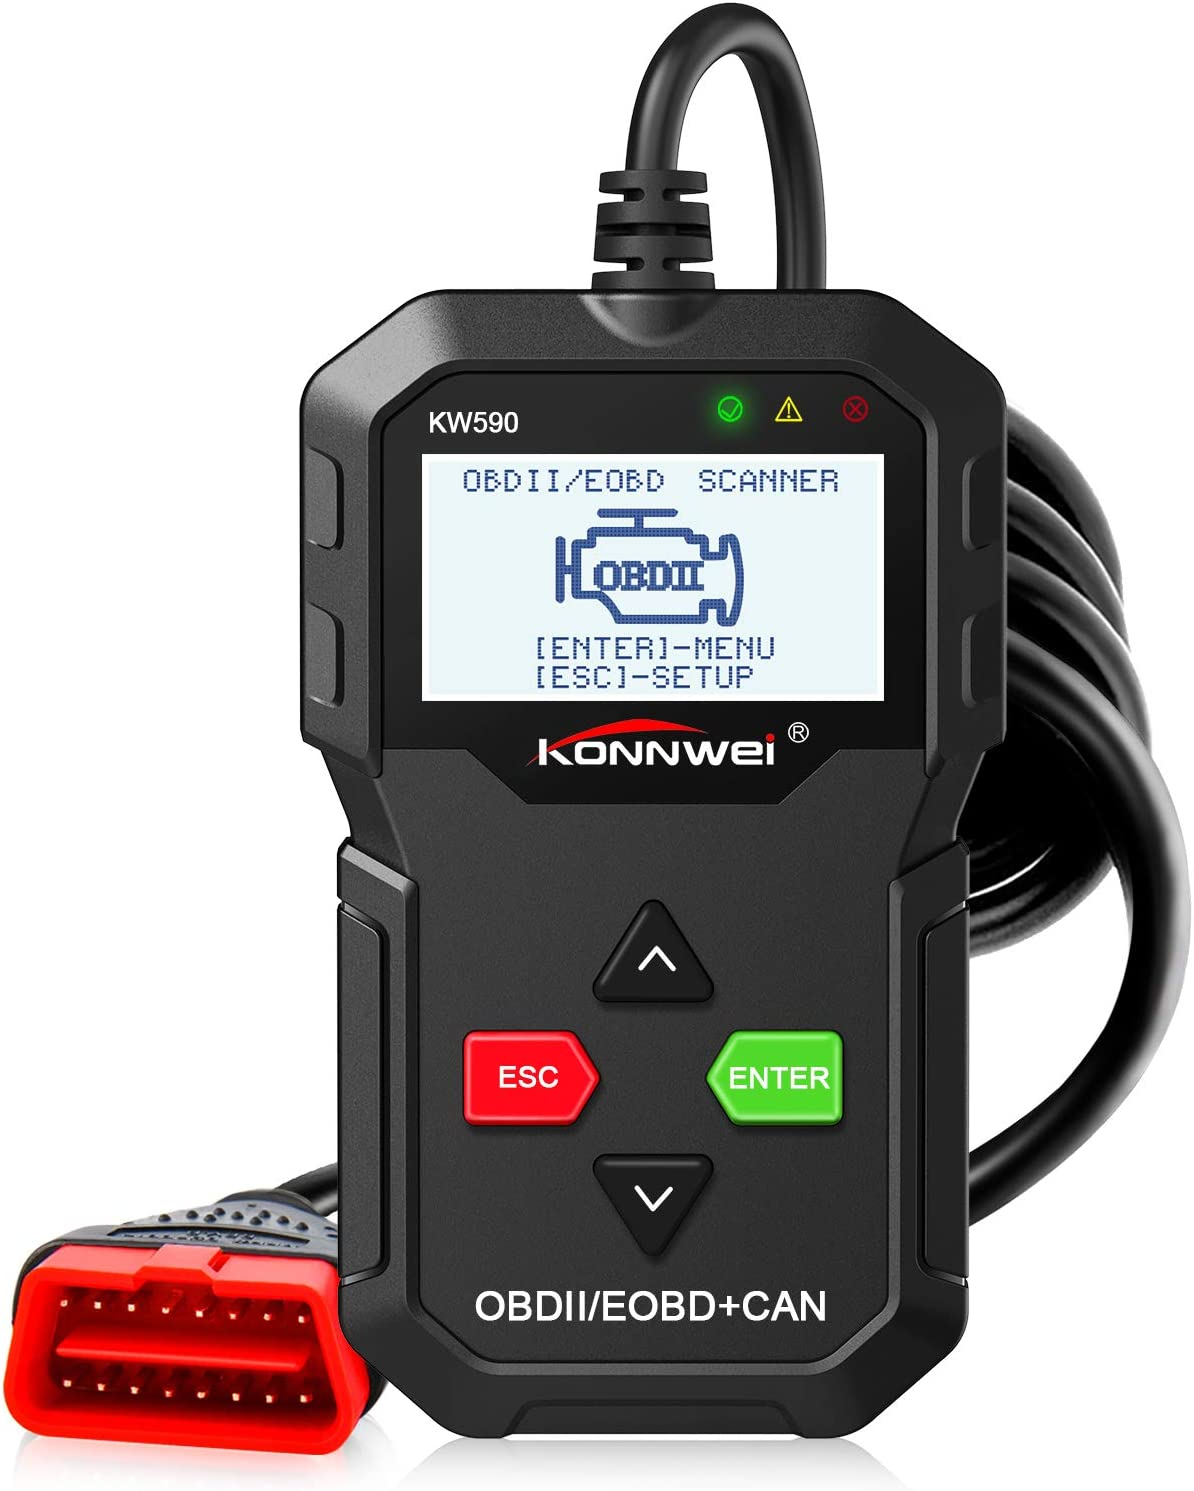 OBDII OBD2 Scanner CAN Car Auto Engine Fault Code Reader Diagnostic Tool KW590